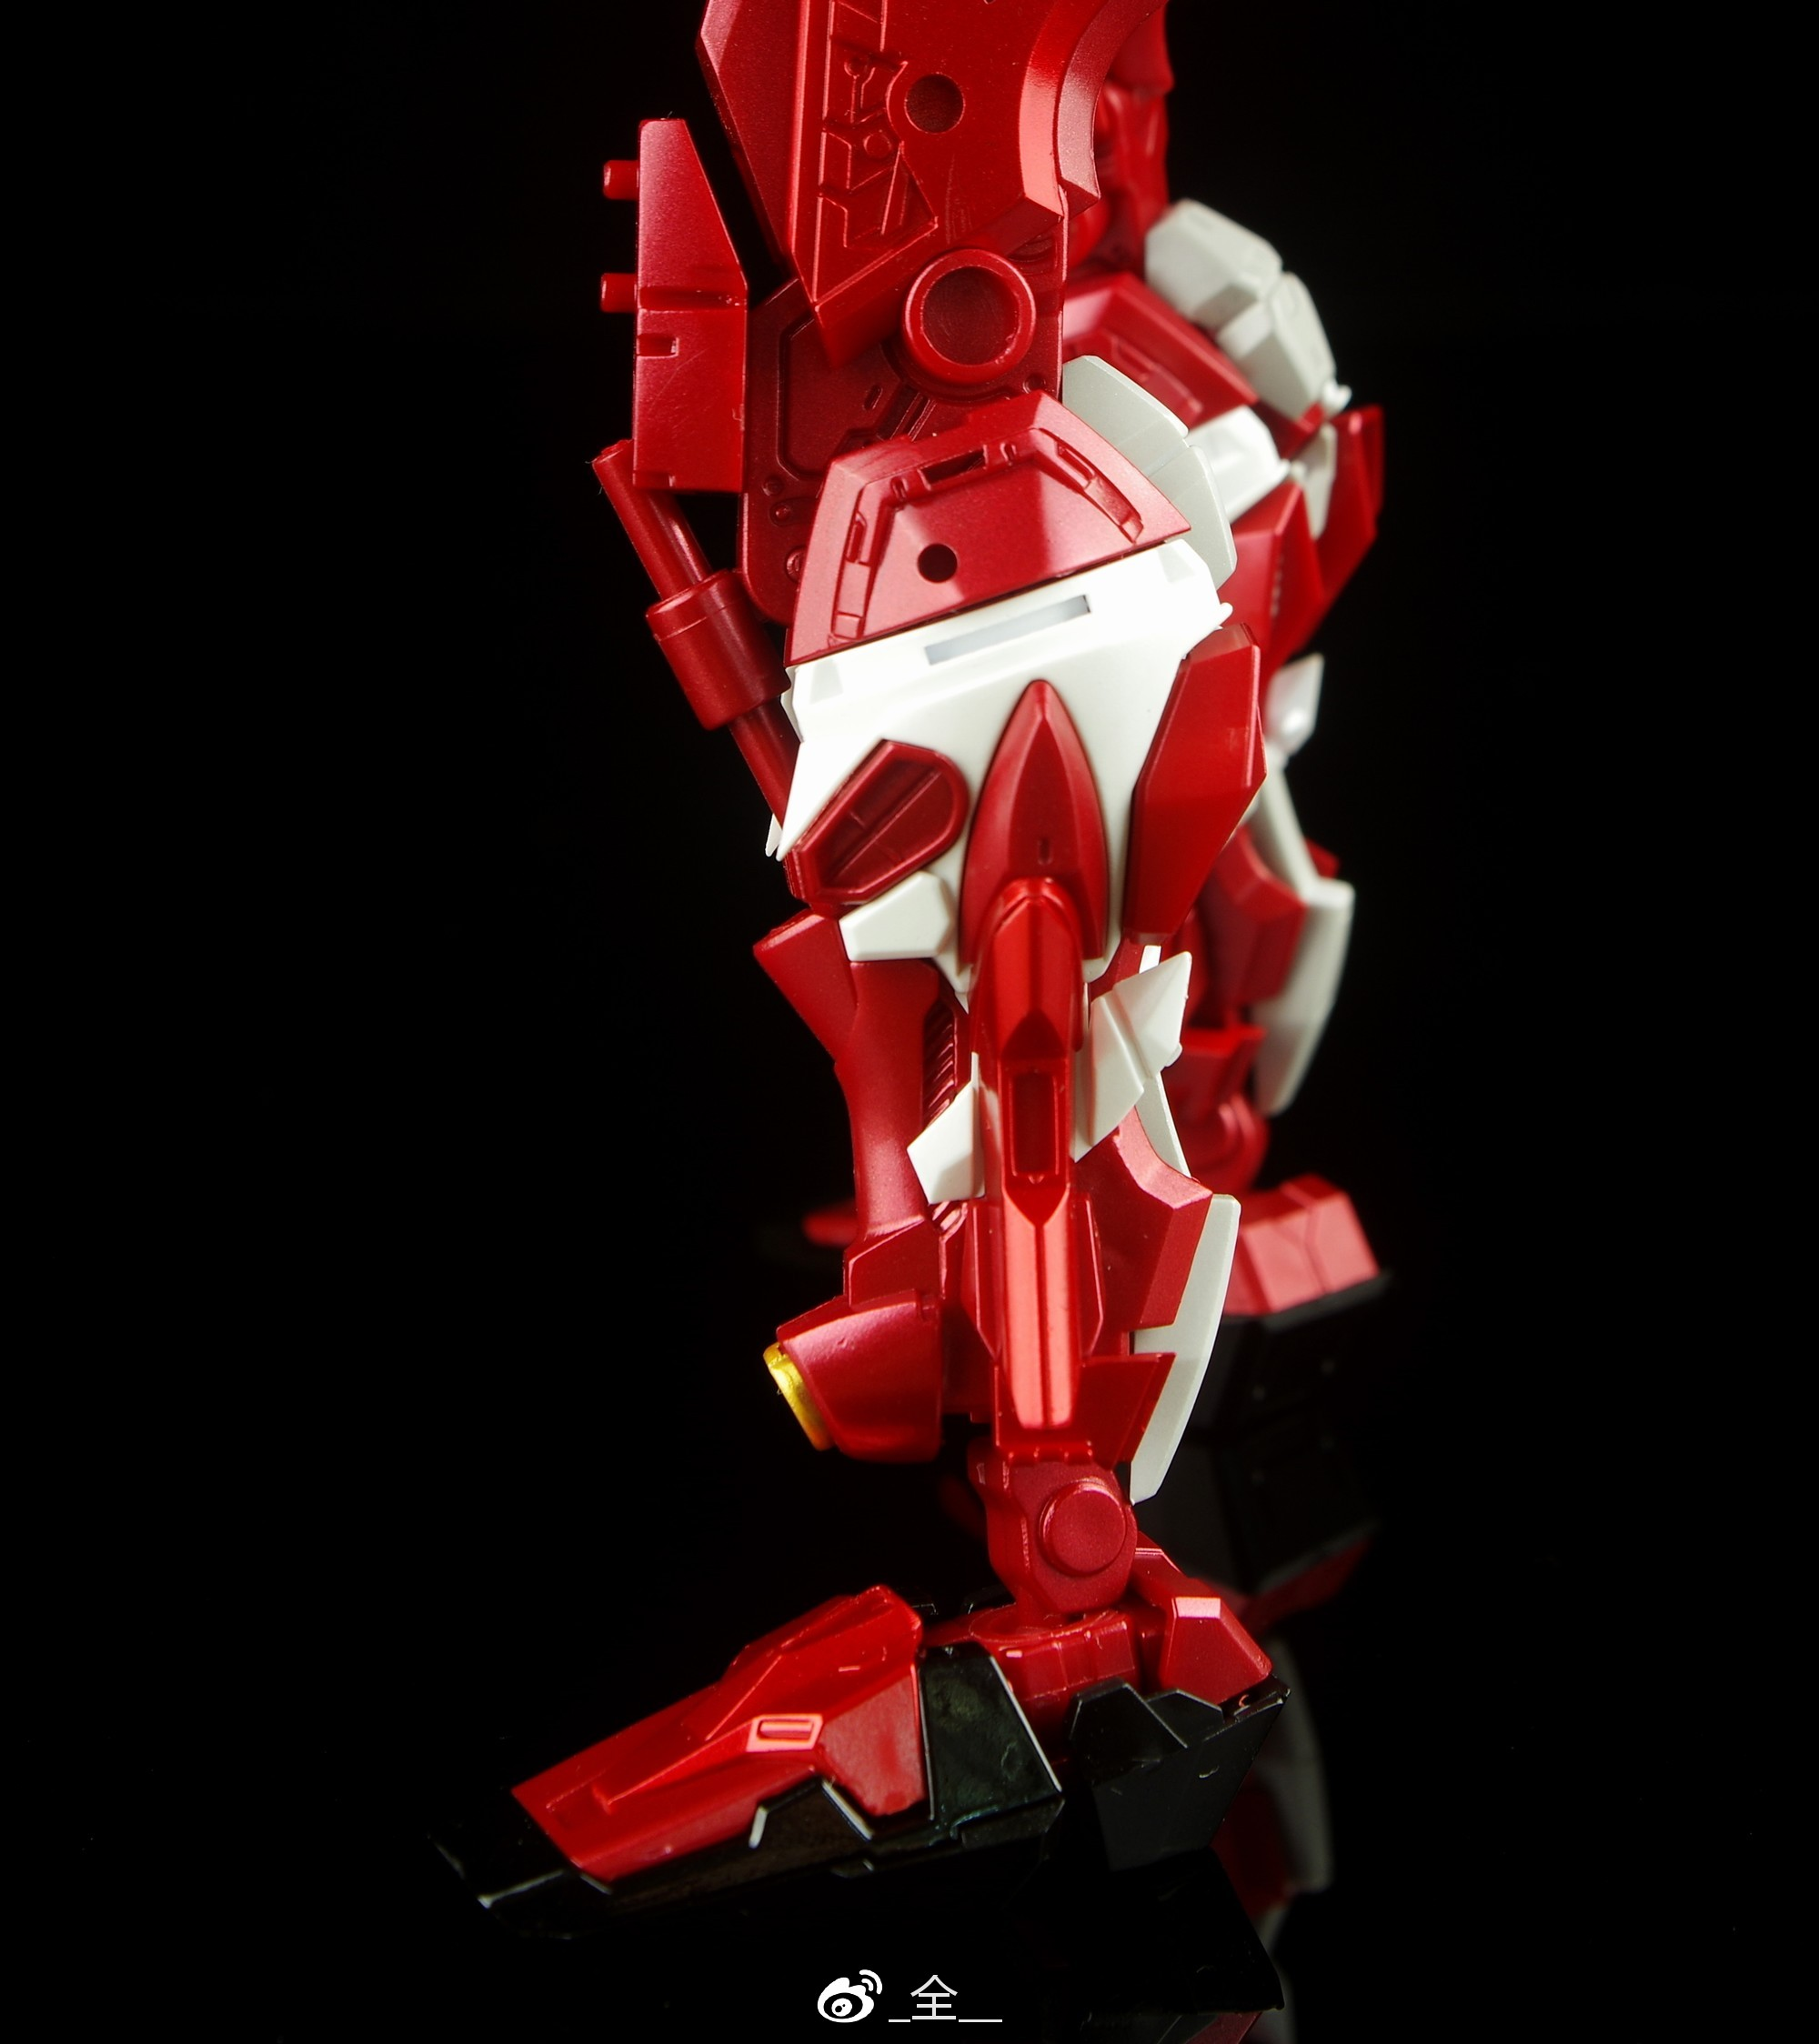 S246_3_MG_astray_red_kan_inask_017.jpg